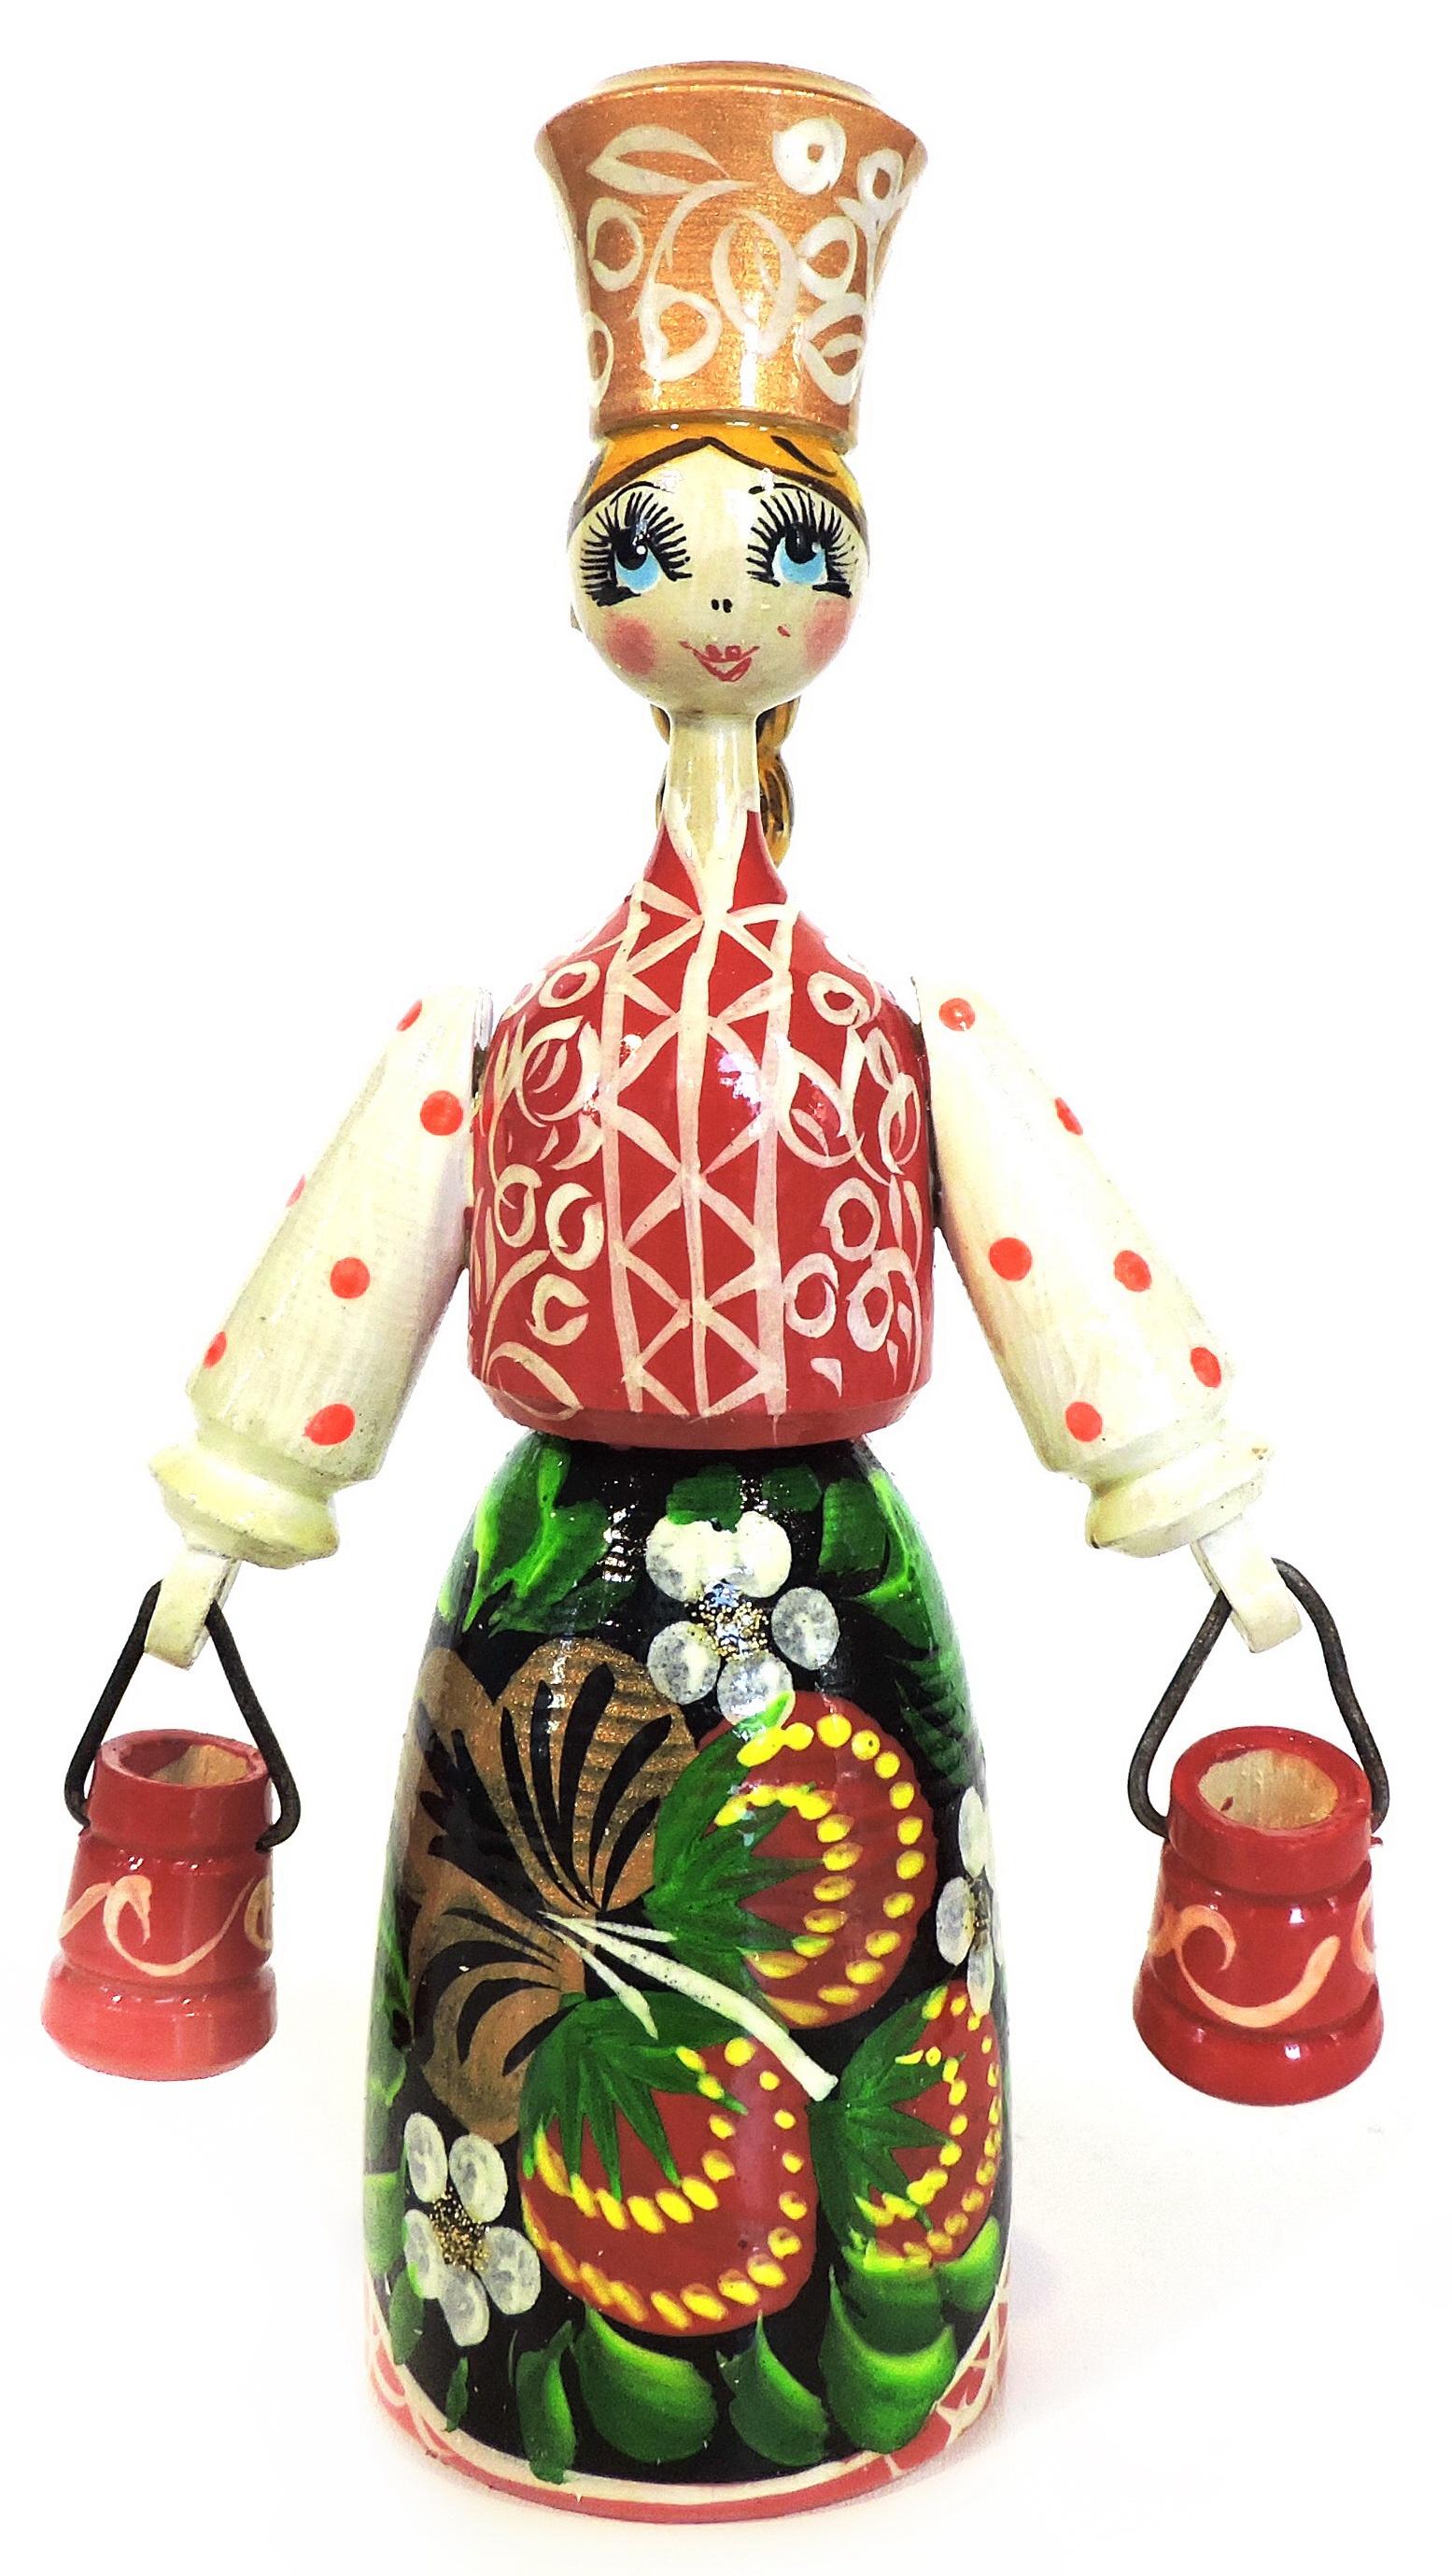 Статуэтка Taowa Кукла, 038-192-1, красный